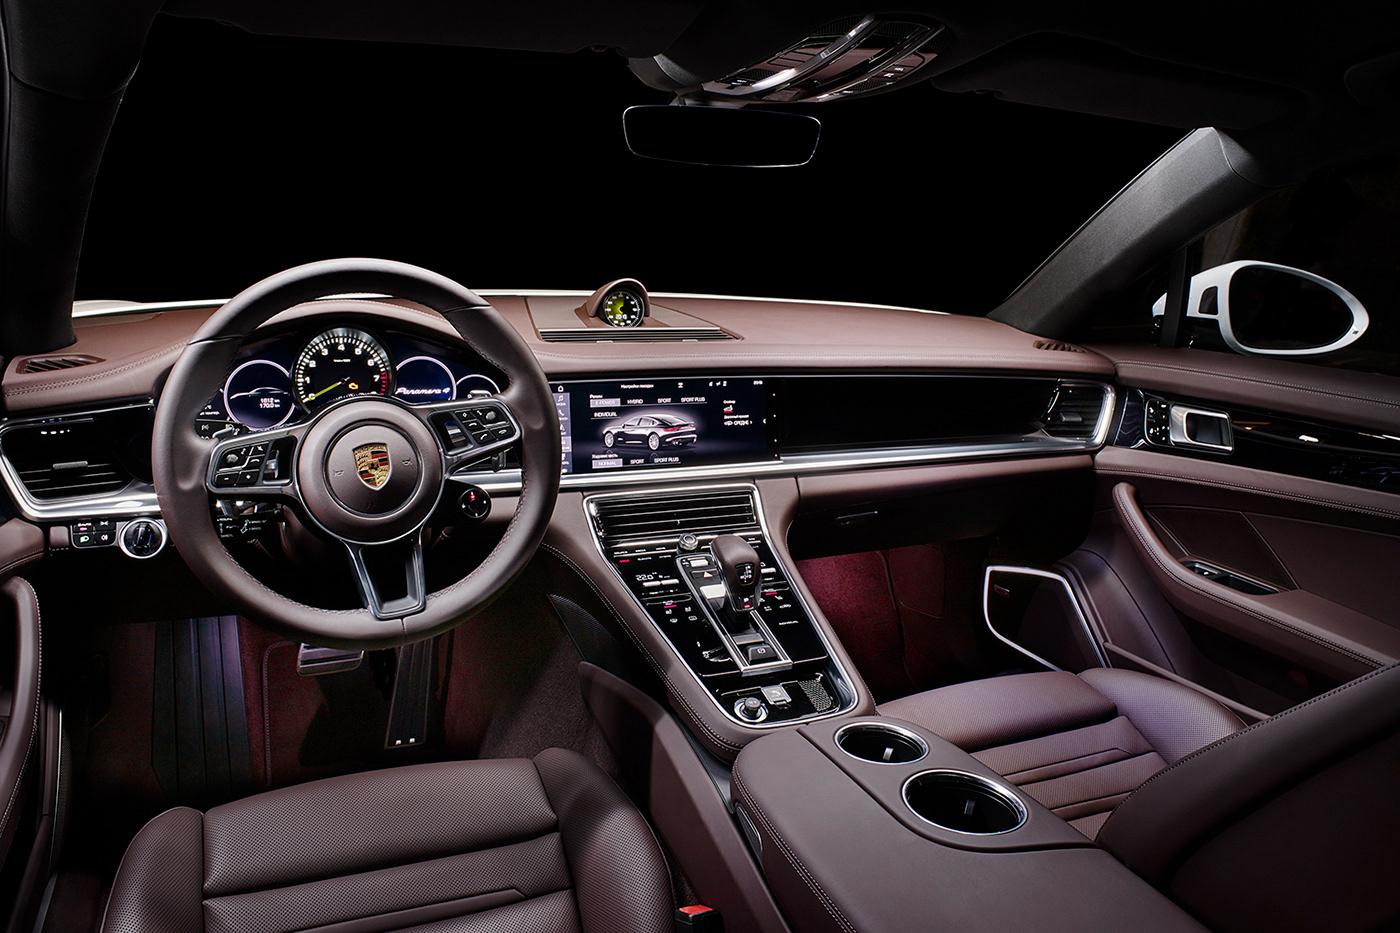 dmitry zhuravlev Photography  automotive   Porsche porsche panamera Esquire